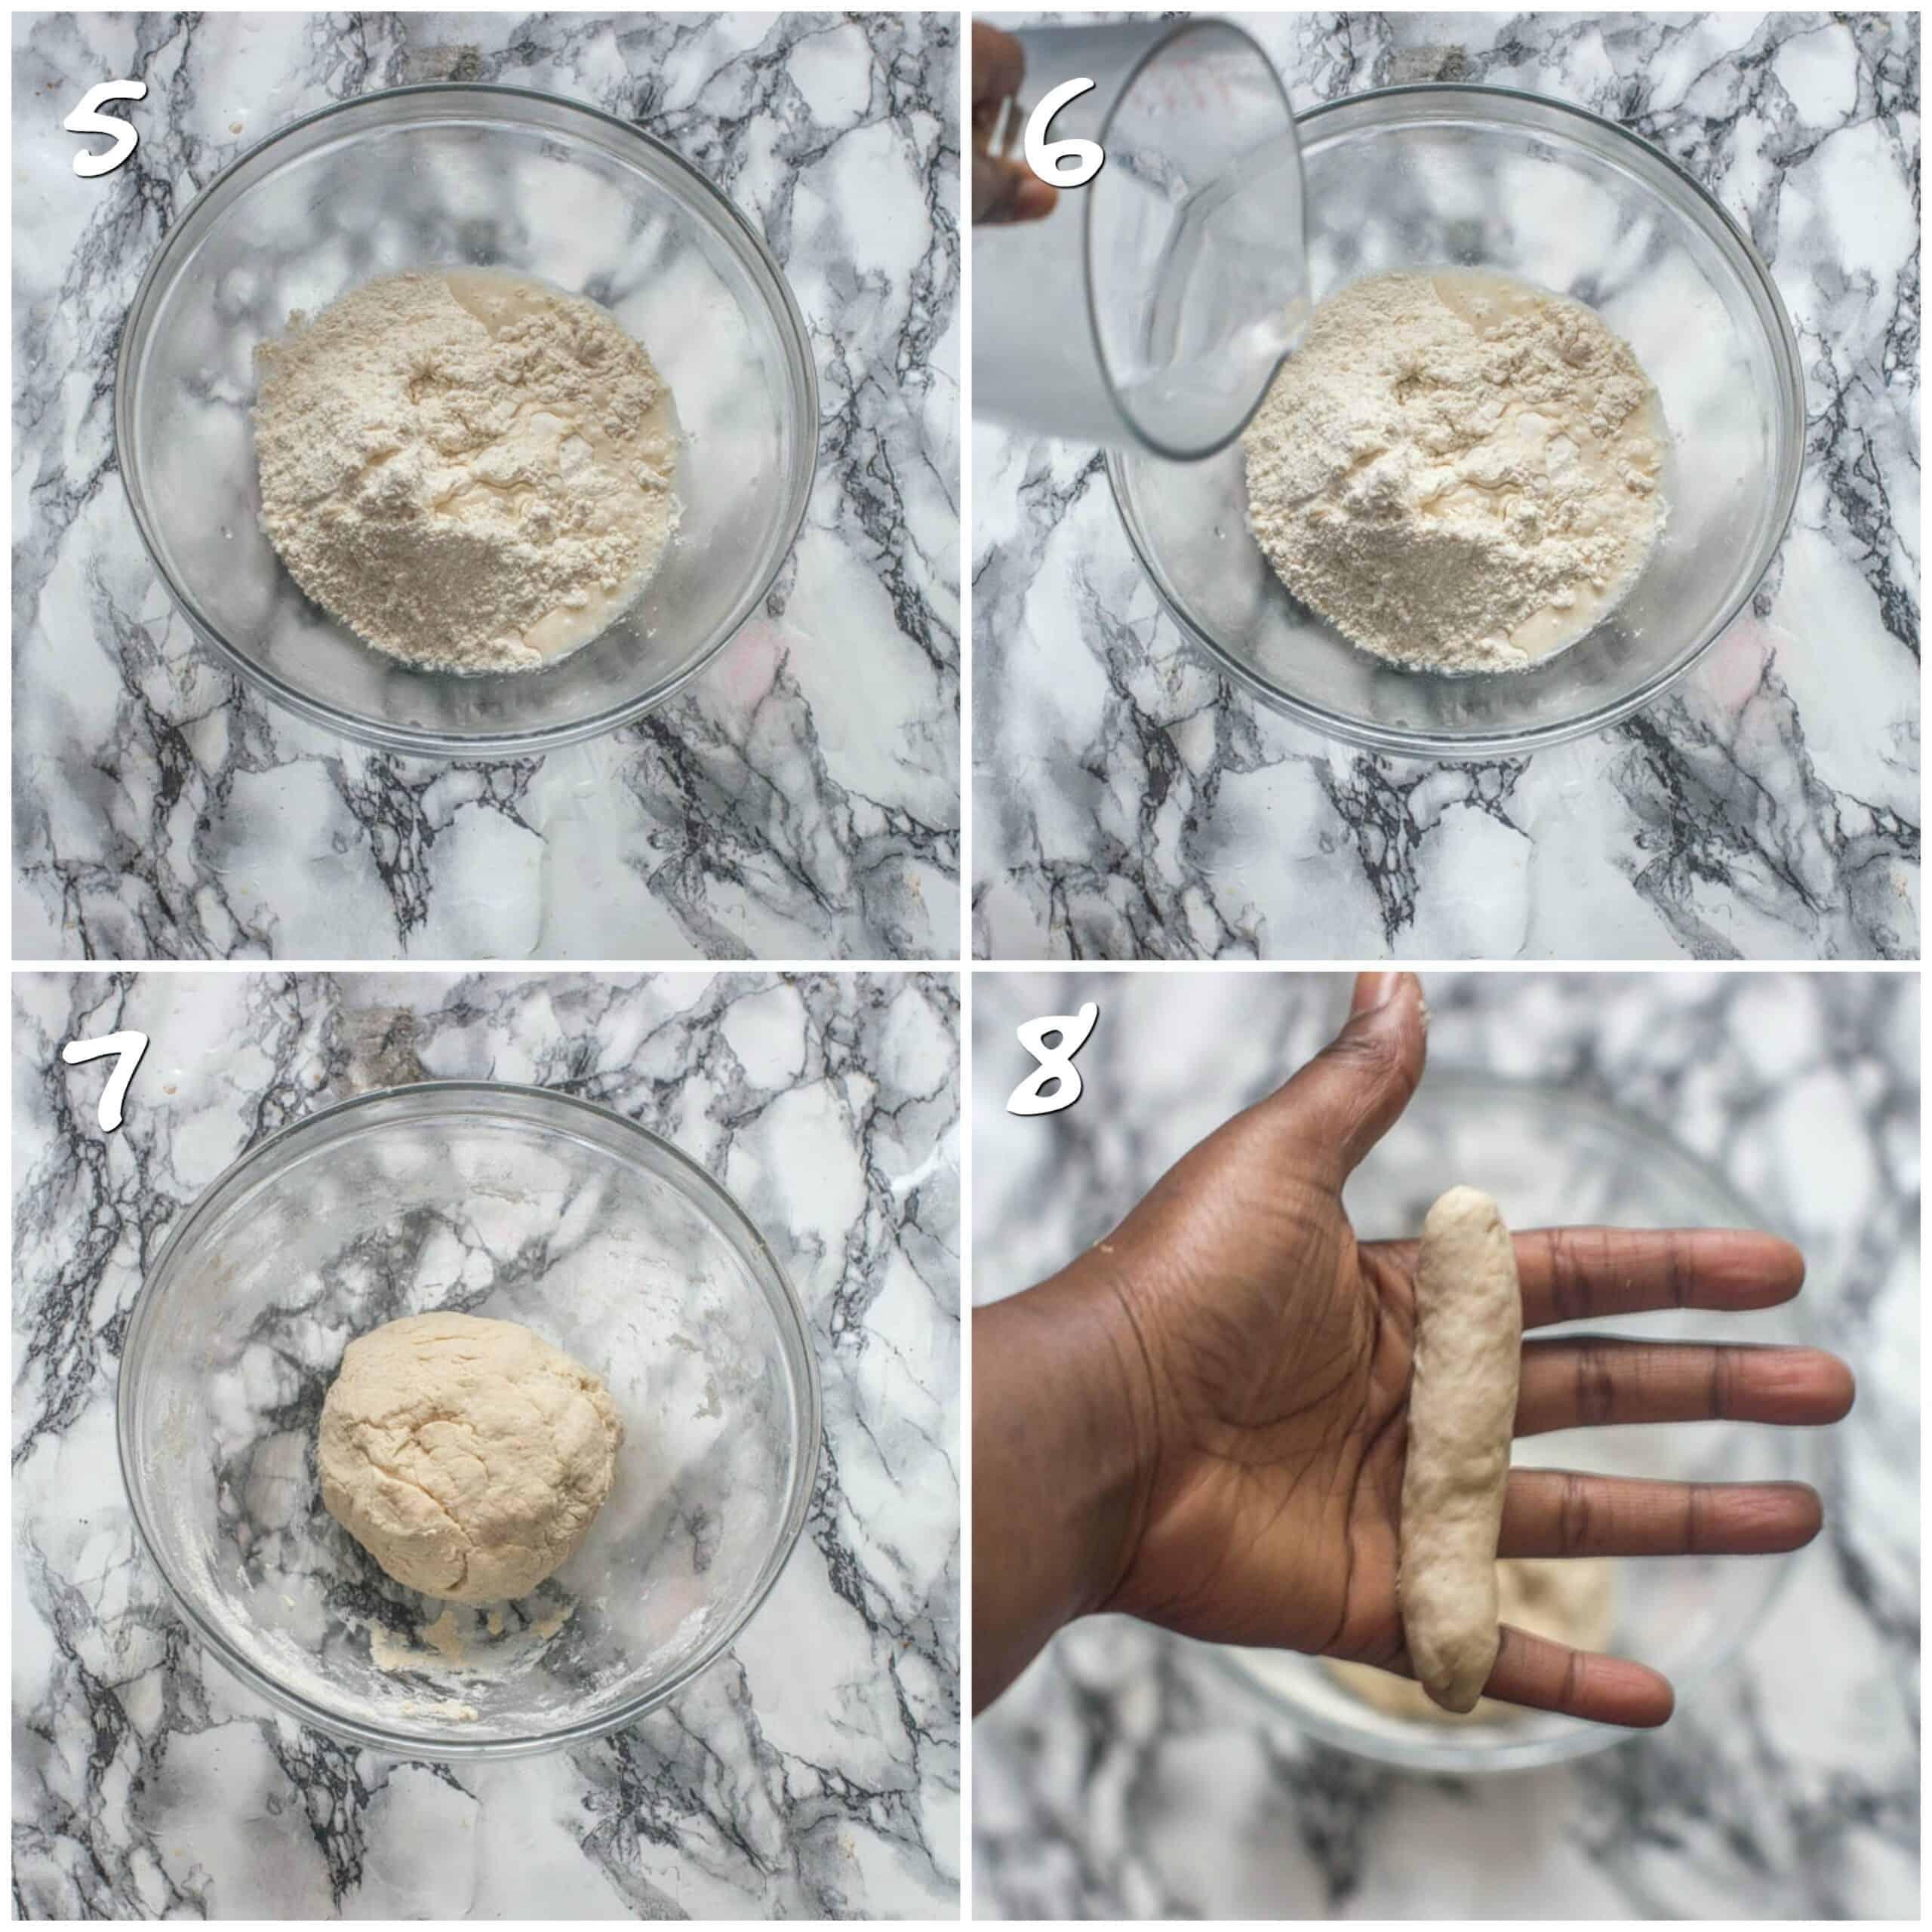 Steps 5-8 making the dumpling